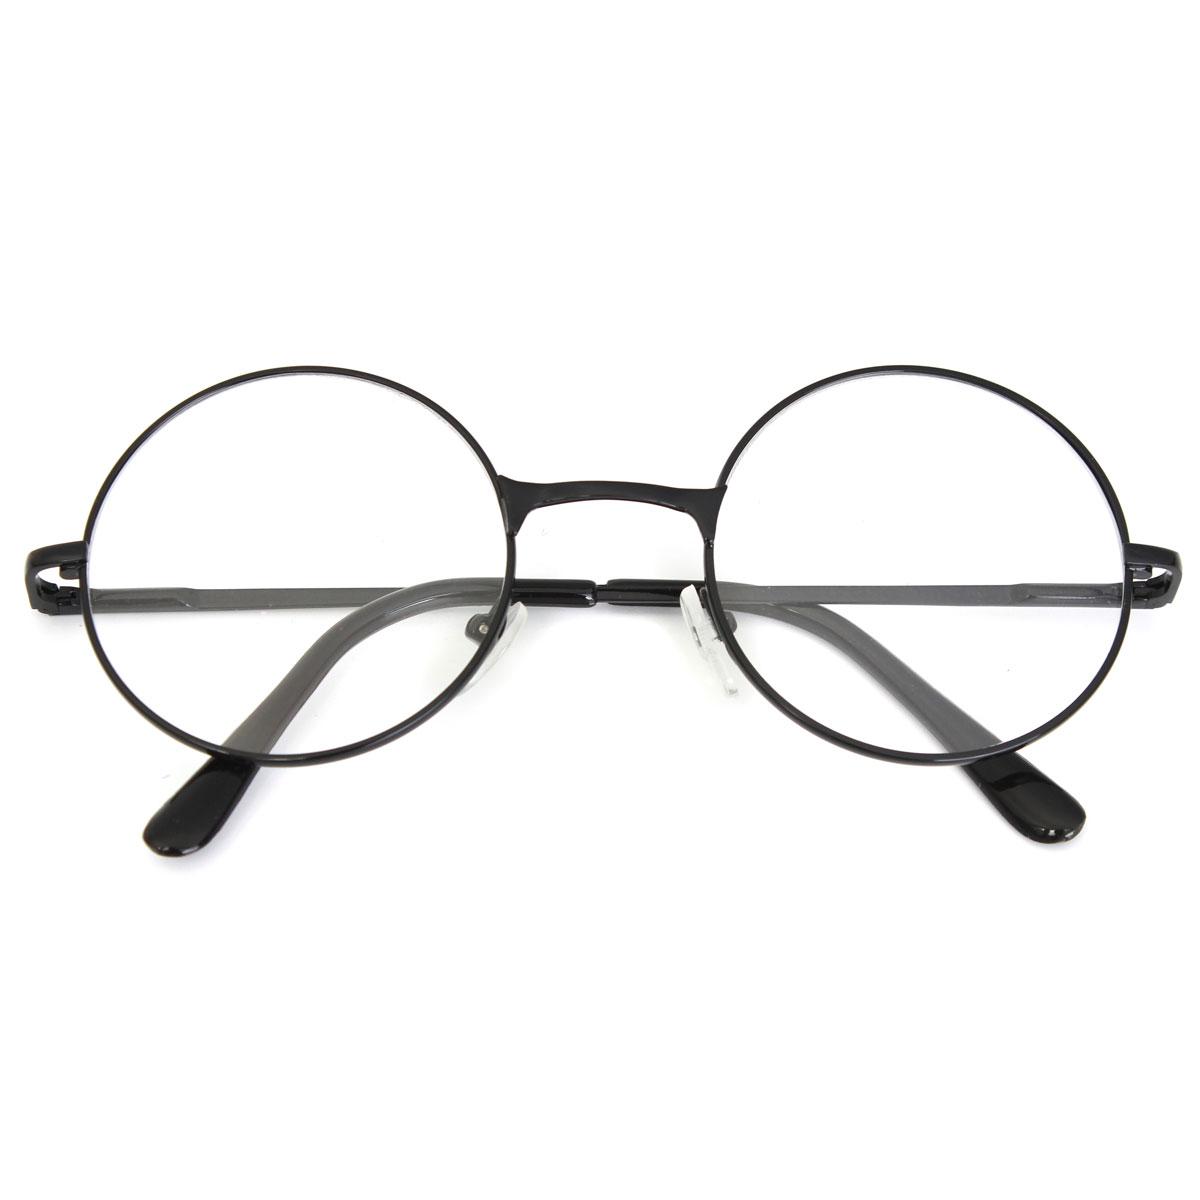 lesebrille lesehilfe rund unisex nerd kult hornbrille metall 1 0 1 5 2 0 2 5 ebay. Black Bedroom Furniture Sets. Home Design Ideas